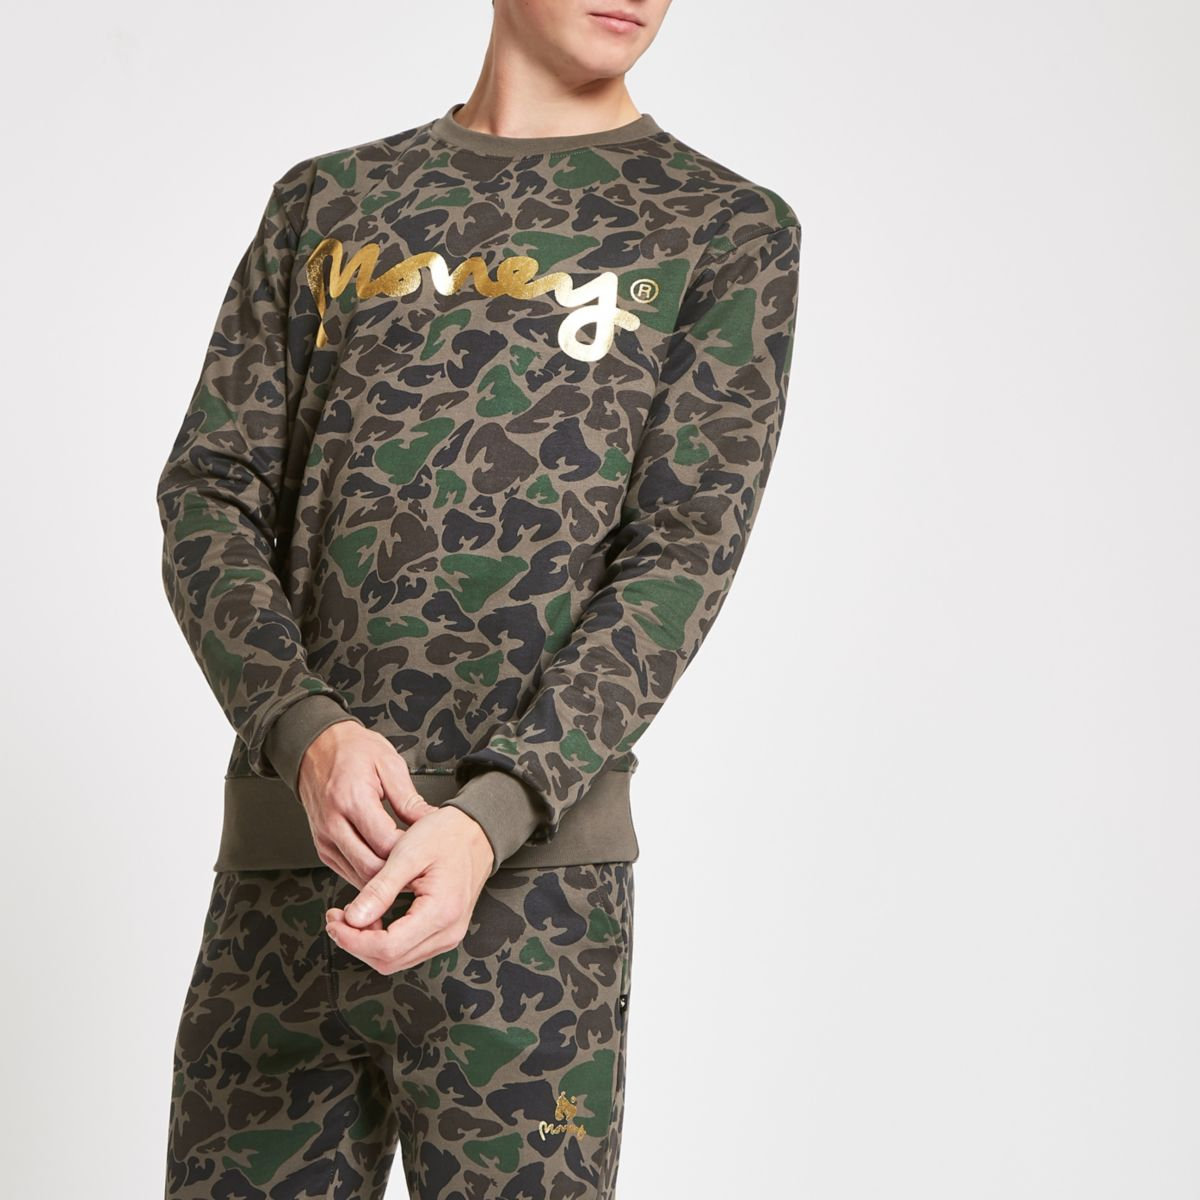 Money Clothing dark brown camo sweatshirt